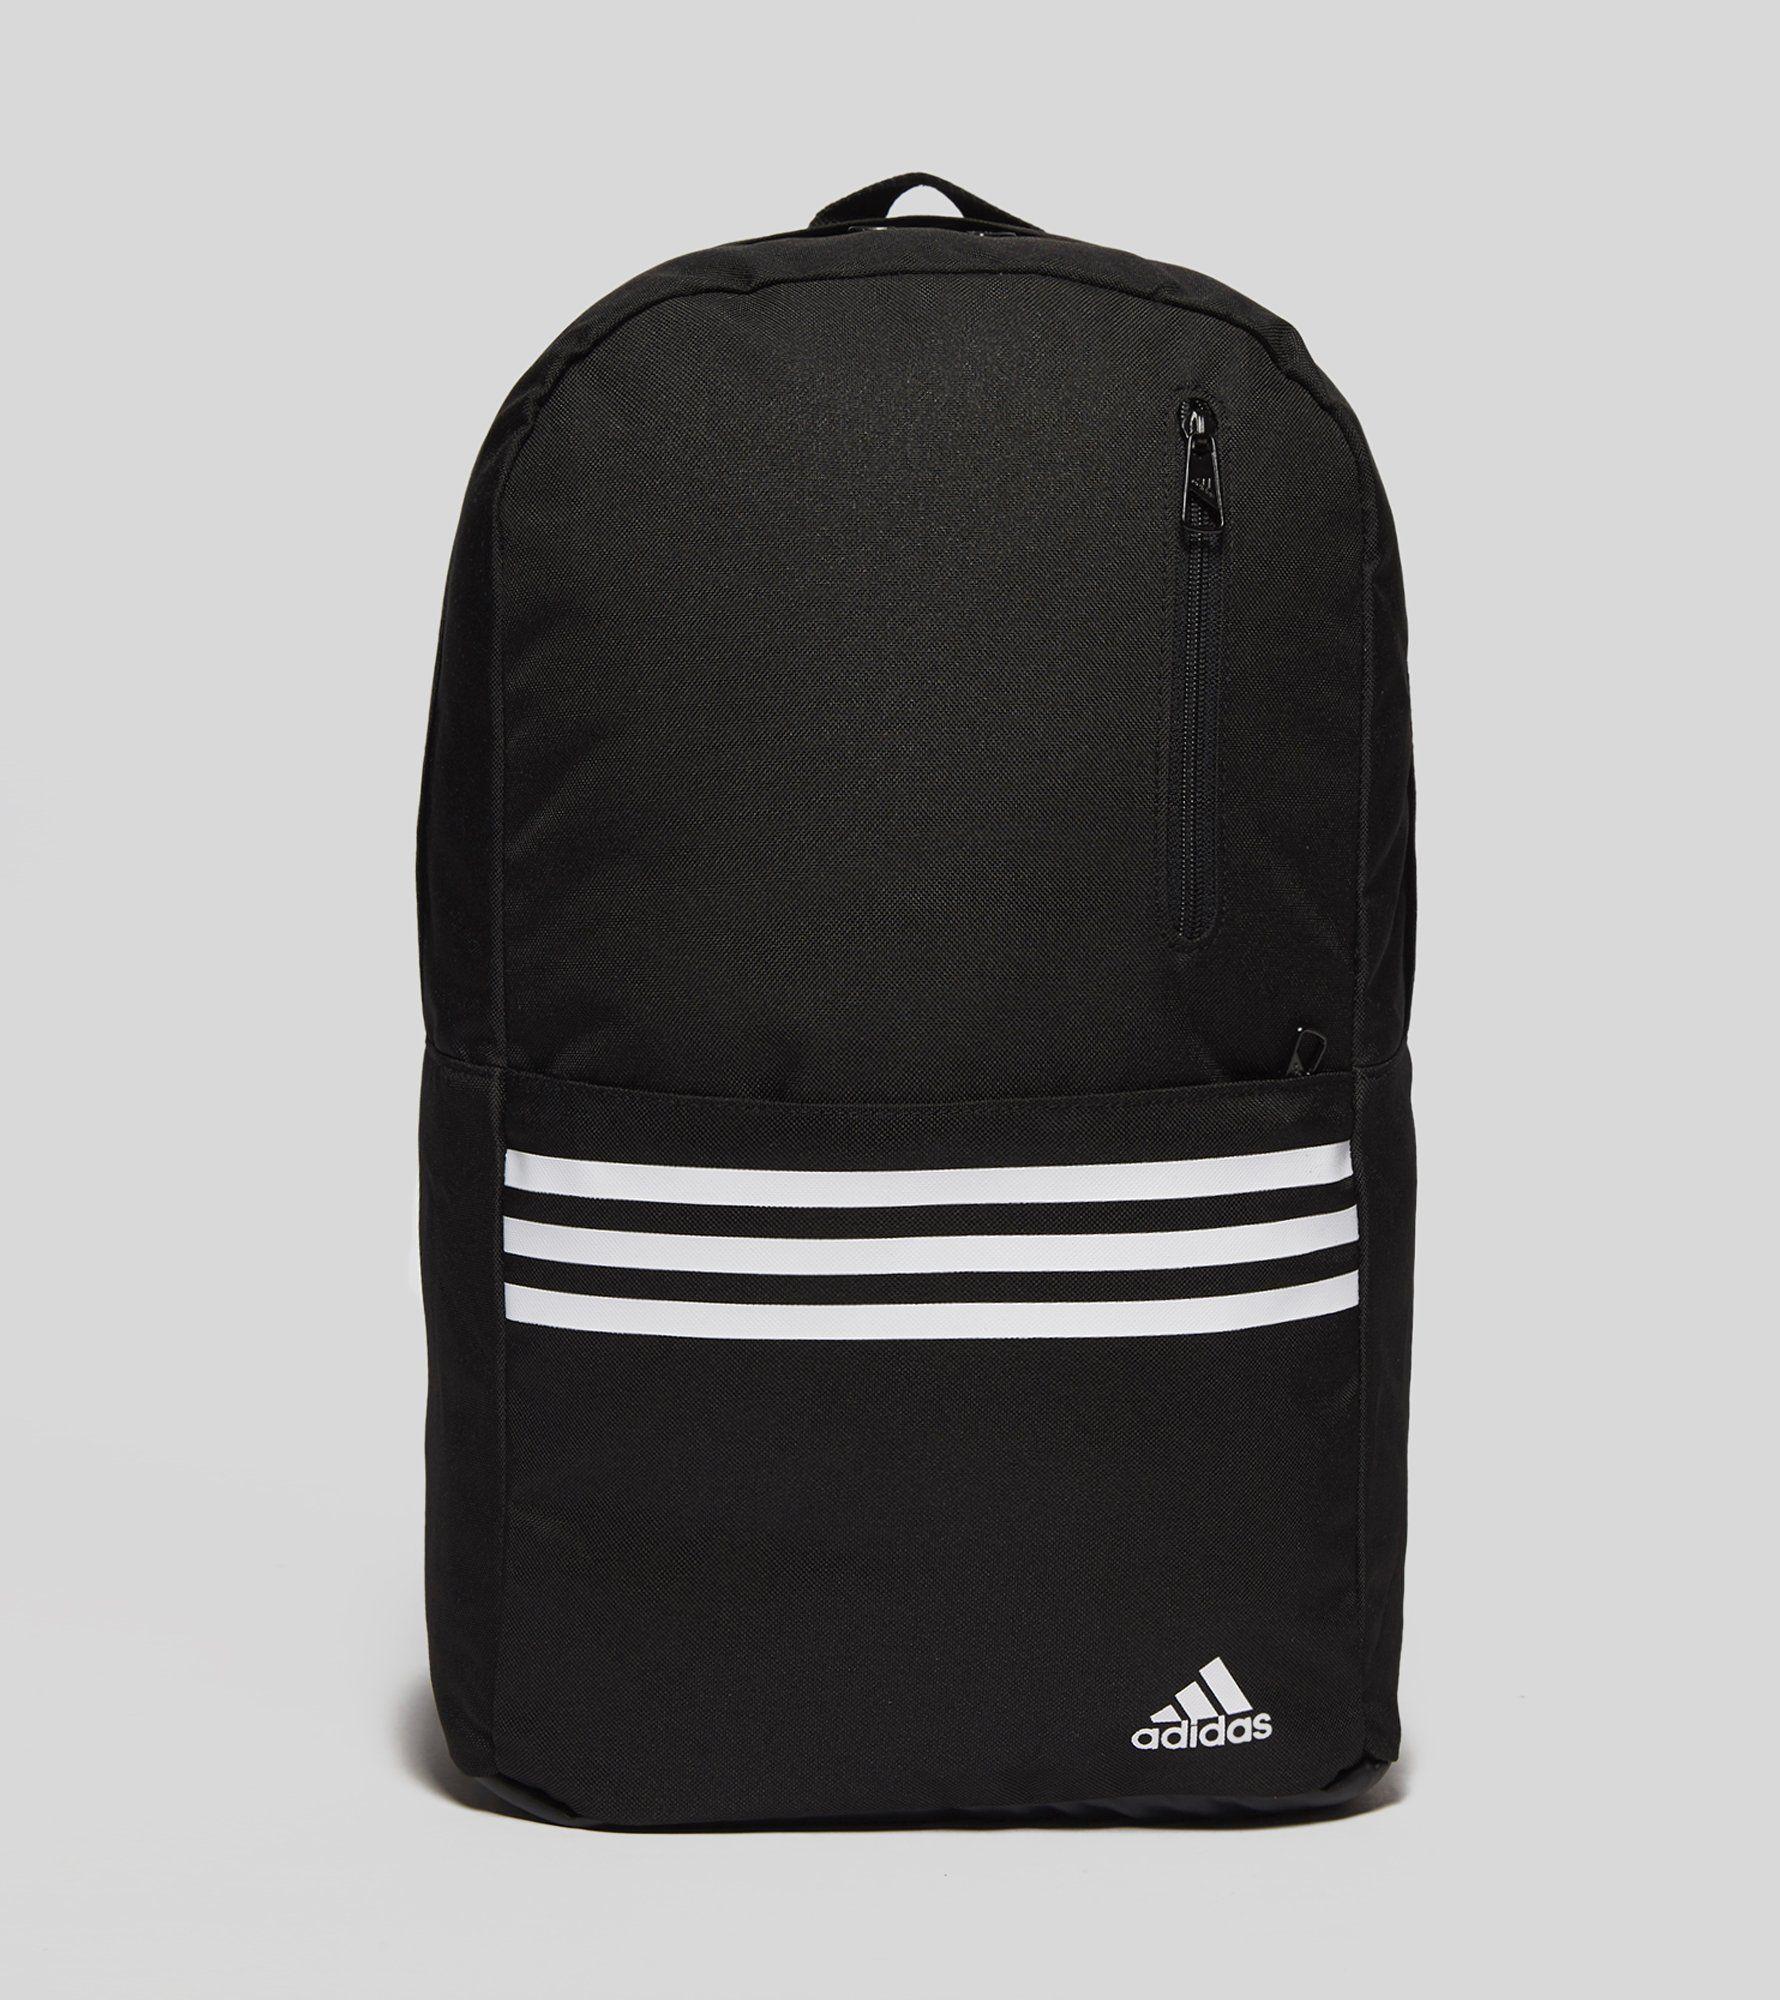 676c604f4 Adidas 3 Stripes Backpack Black White- Fenix Toulouse Handball